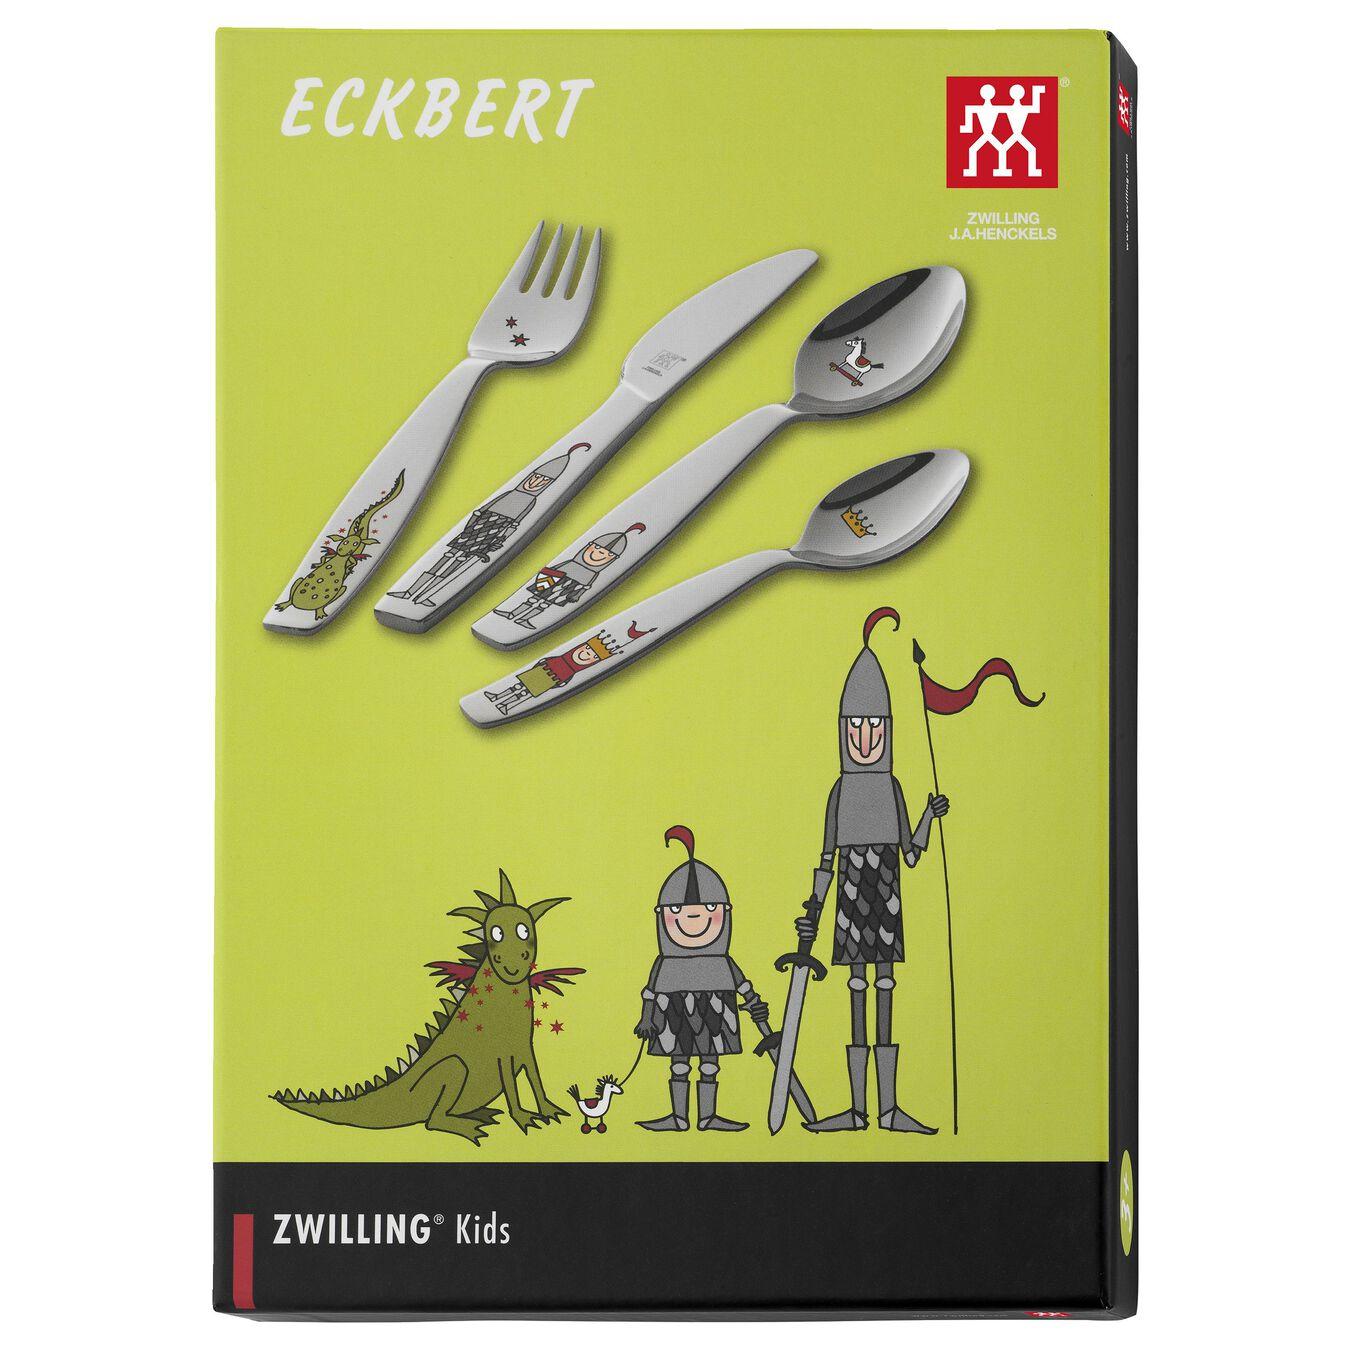 Eckbert Kinderbesteck 4-tlg, poliert,,large 2